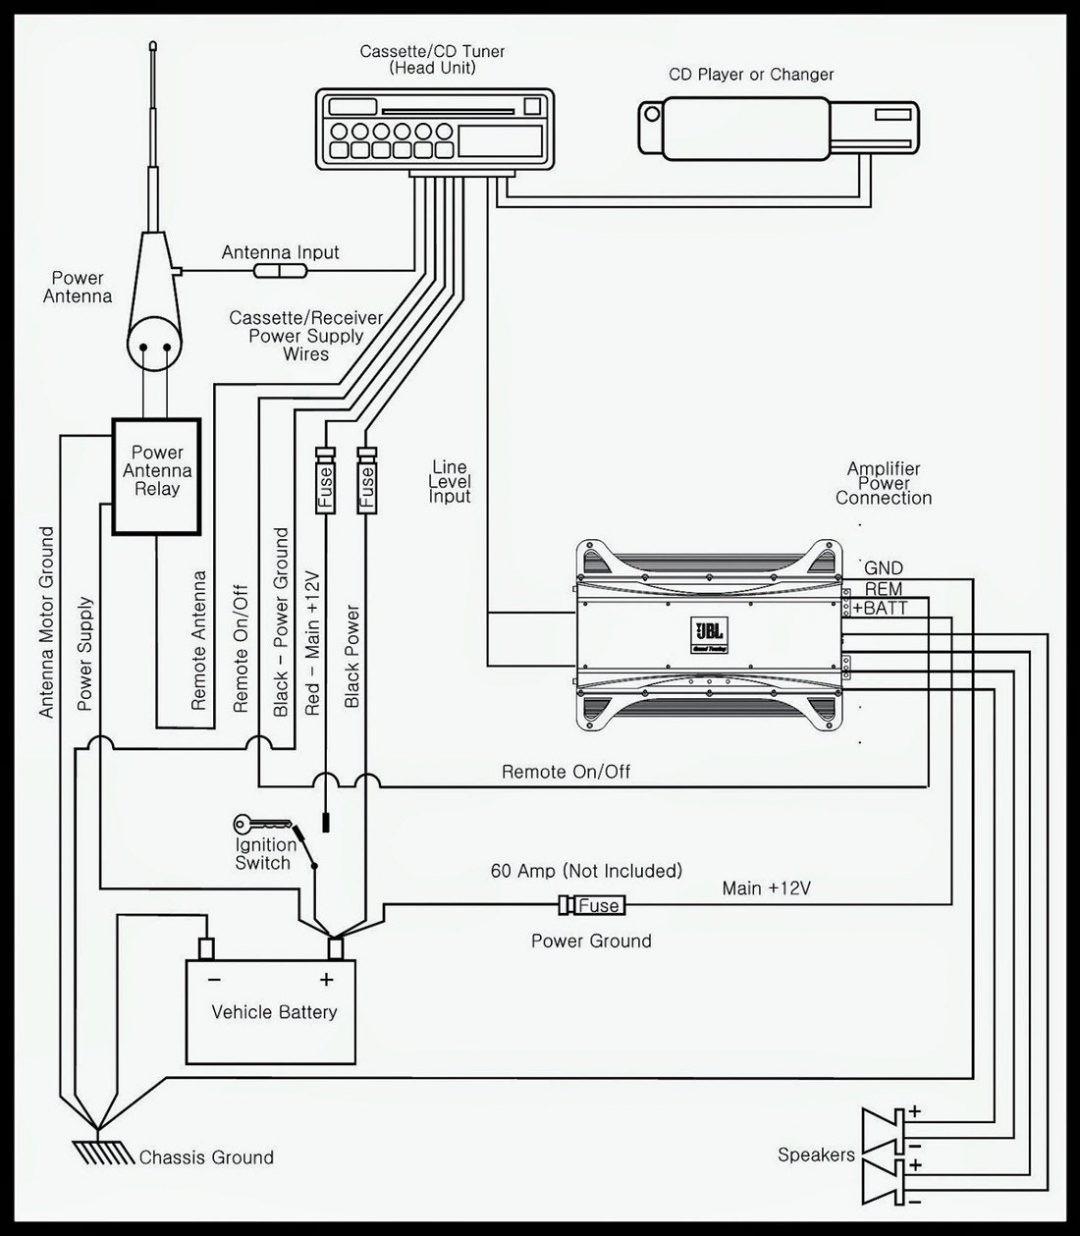 Malibu Ml88t Wiring Diagram Lighting Diagrams Landscape Wire Image